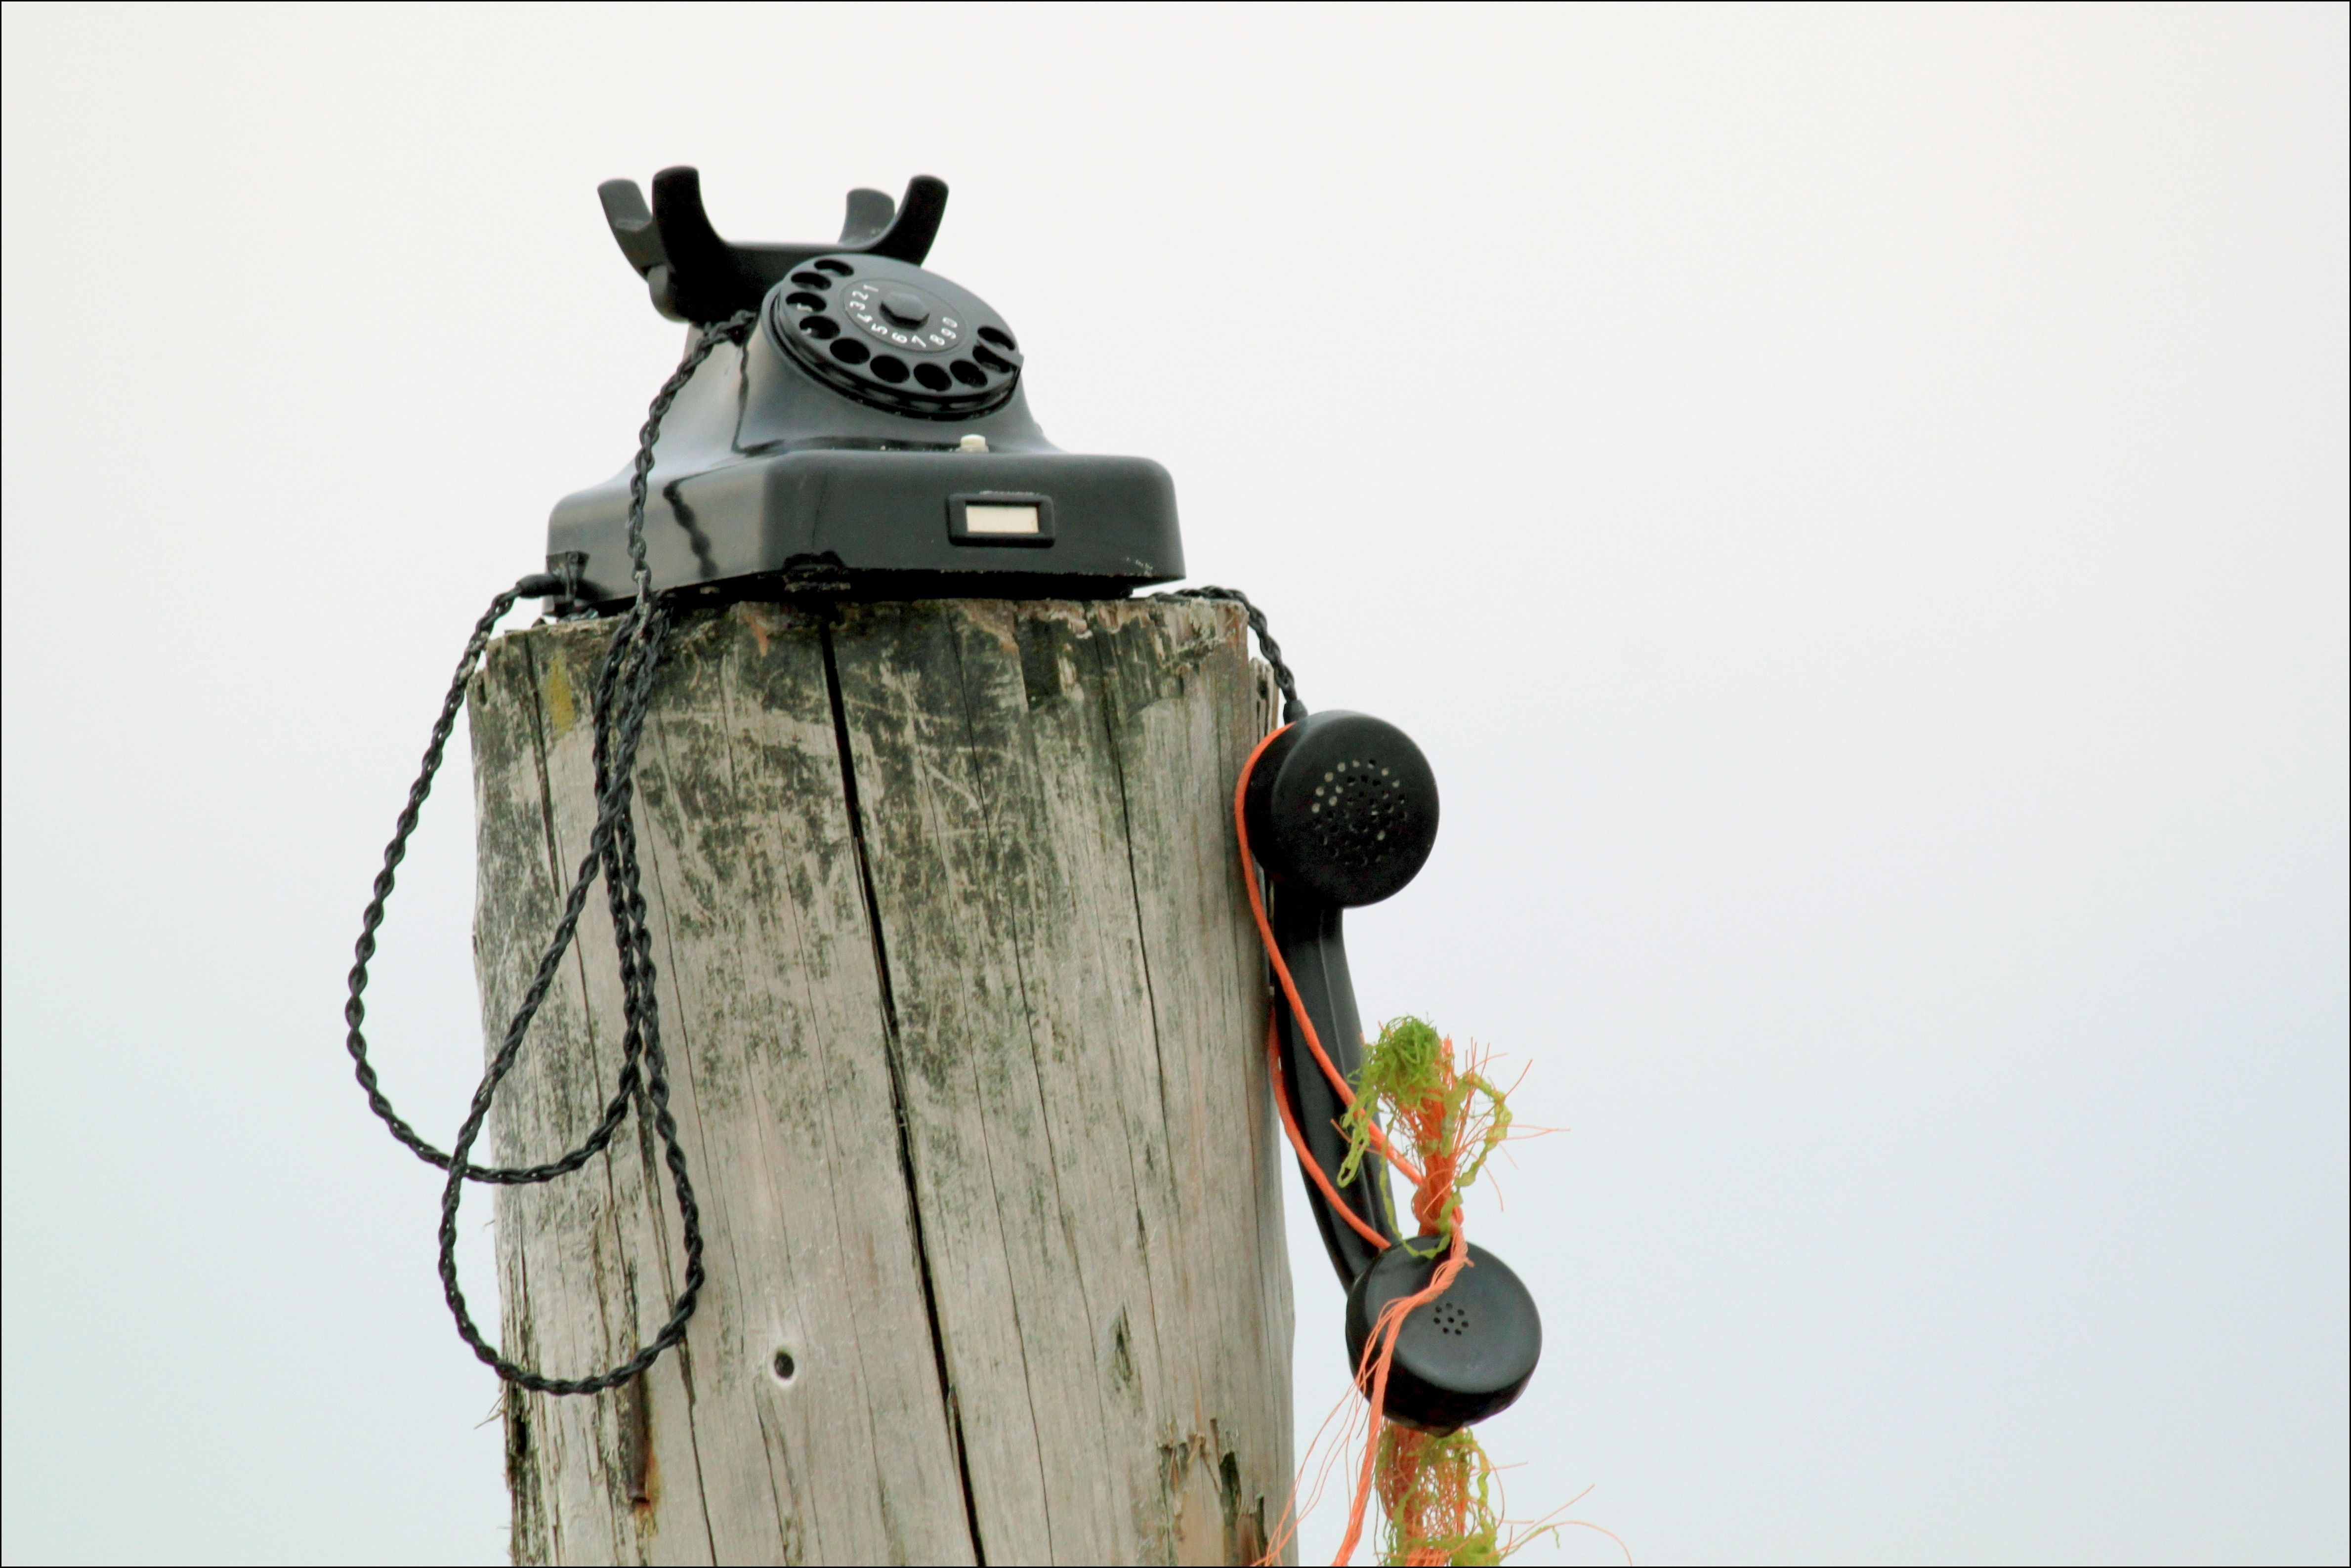 mejorar cobertura de tu teléfono